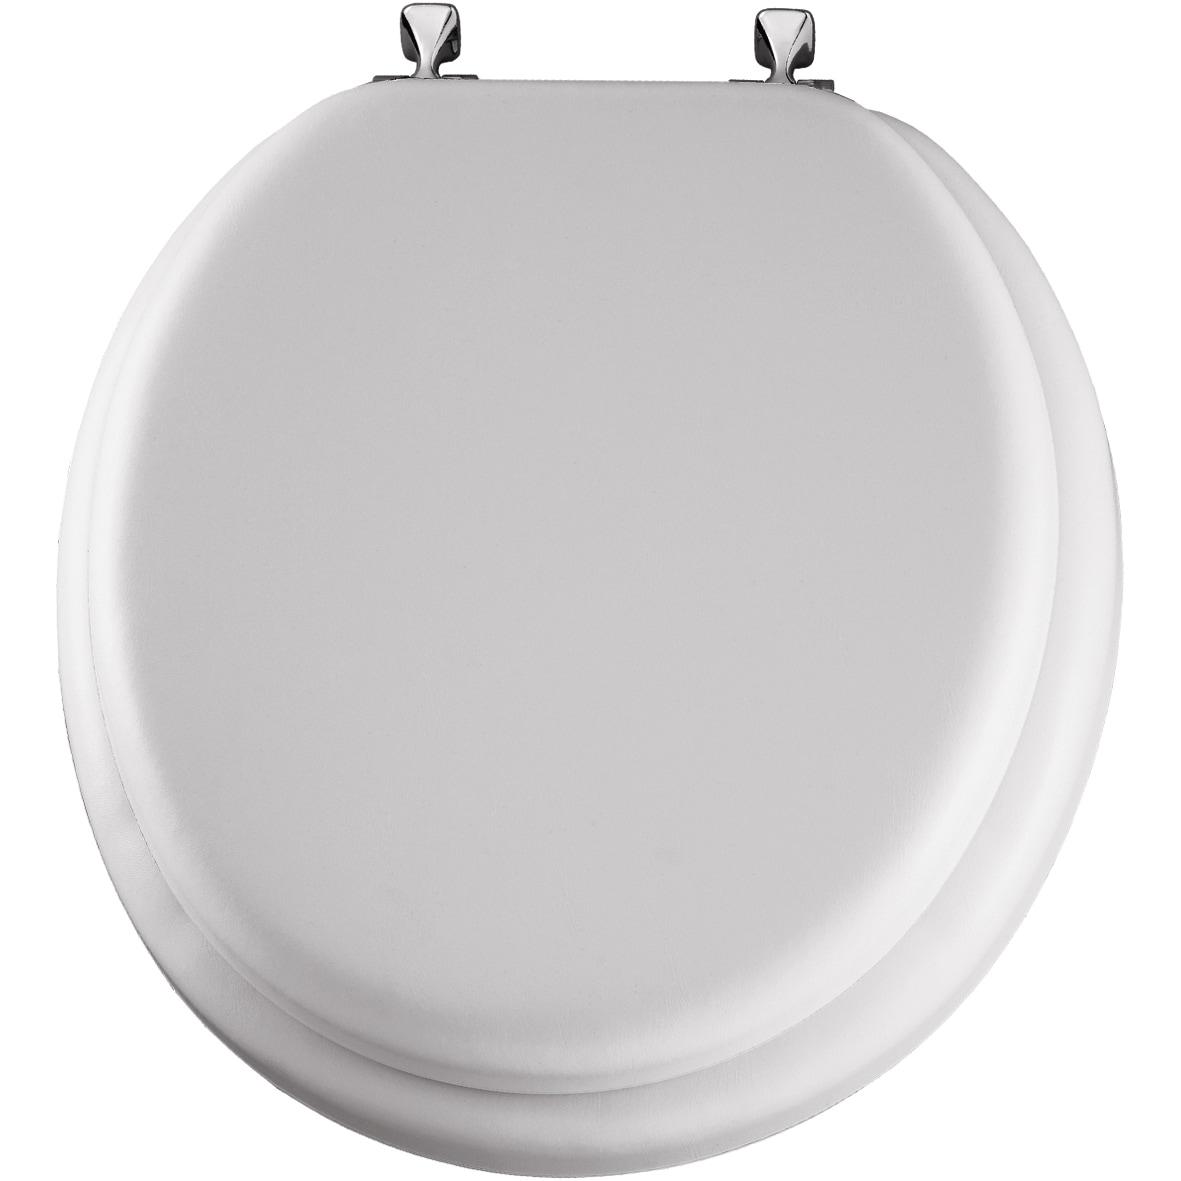 Phenomenal Mayfair 13Cp 000 Round Deluxe Soft Toilet Seat Evergreenethics Interior Chair Design Evergreenethicsorg